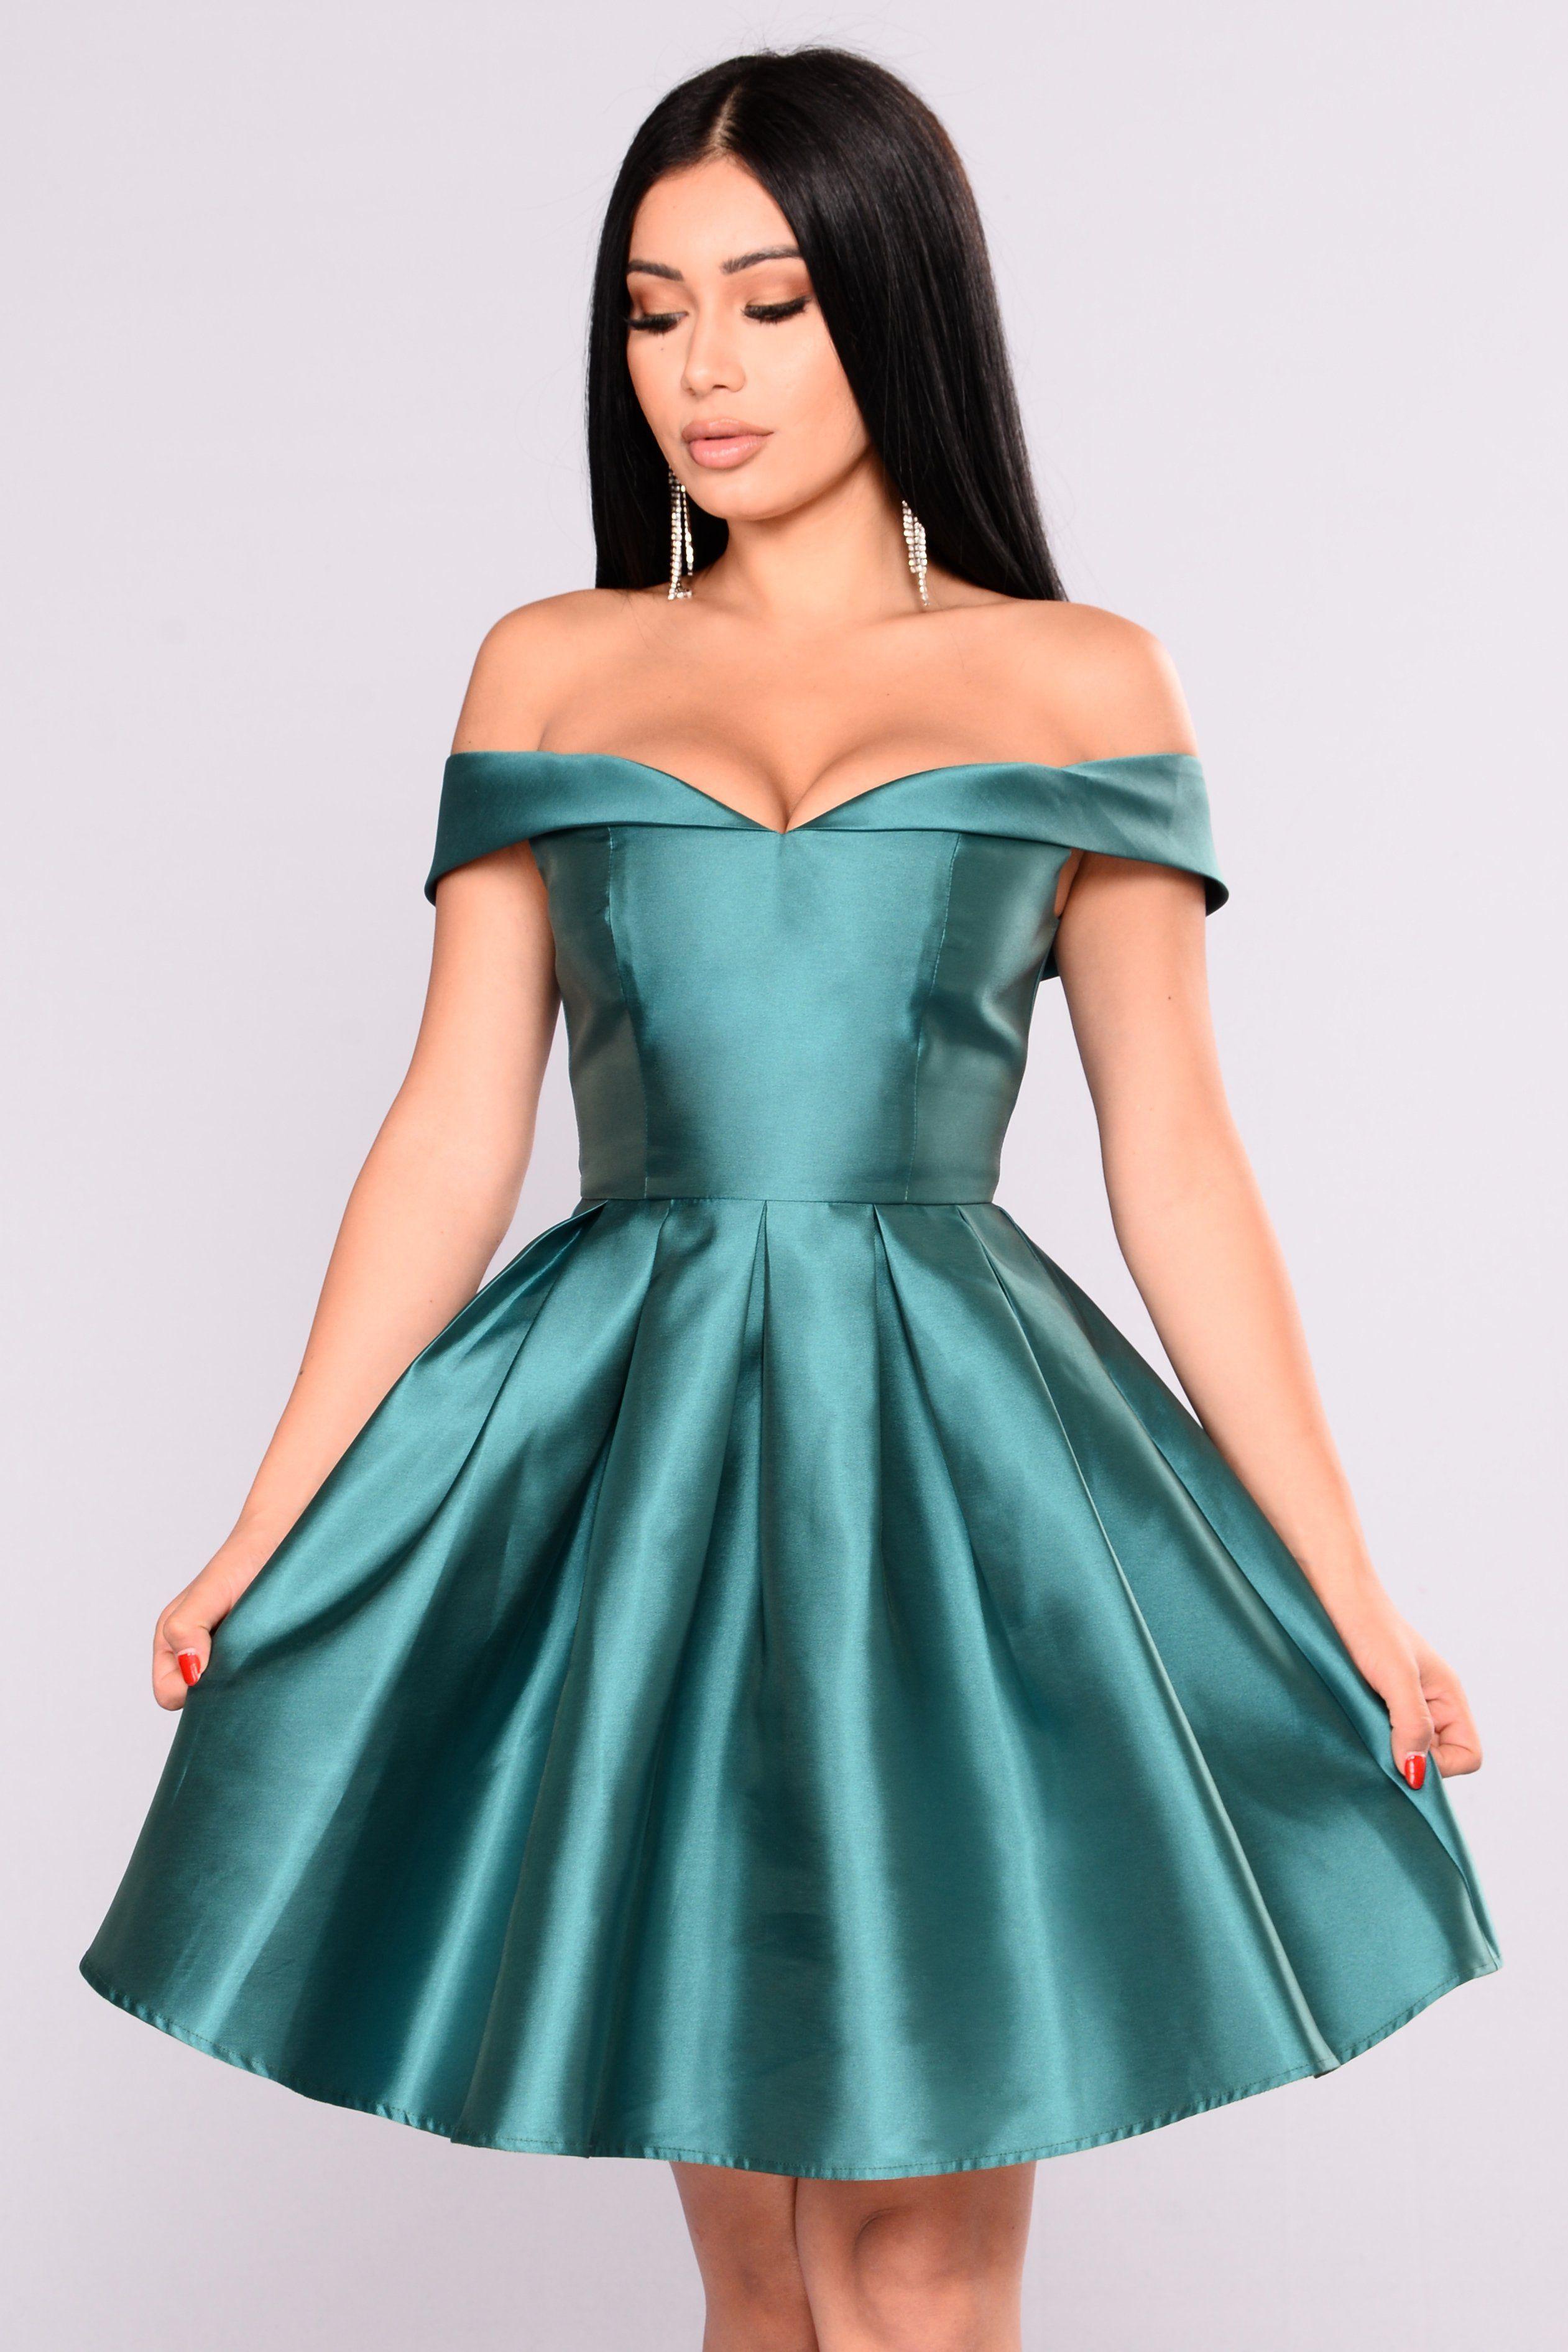 Wonderful Life Dress - Hunter Green | Wonderful life, Green party ...